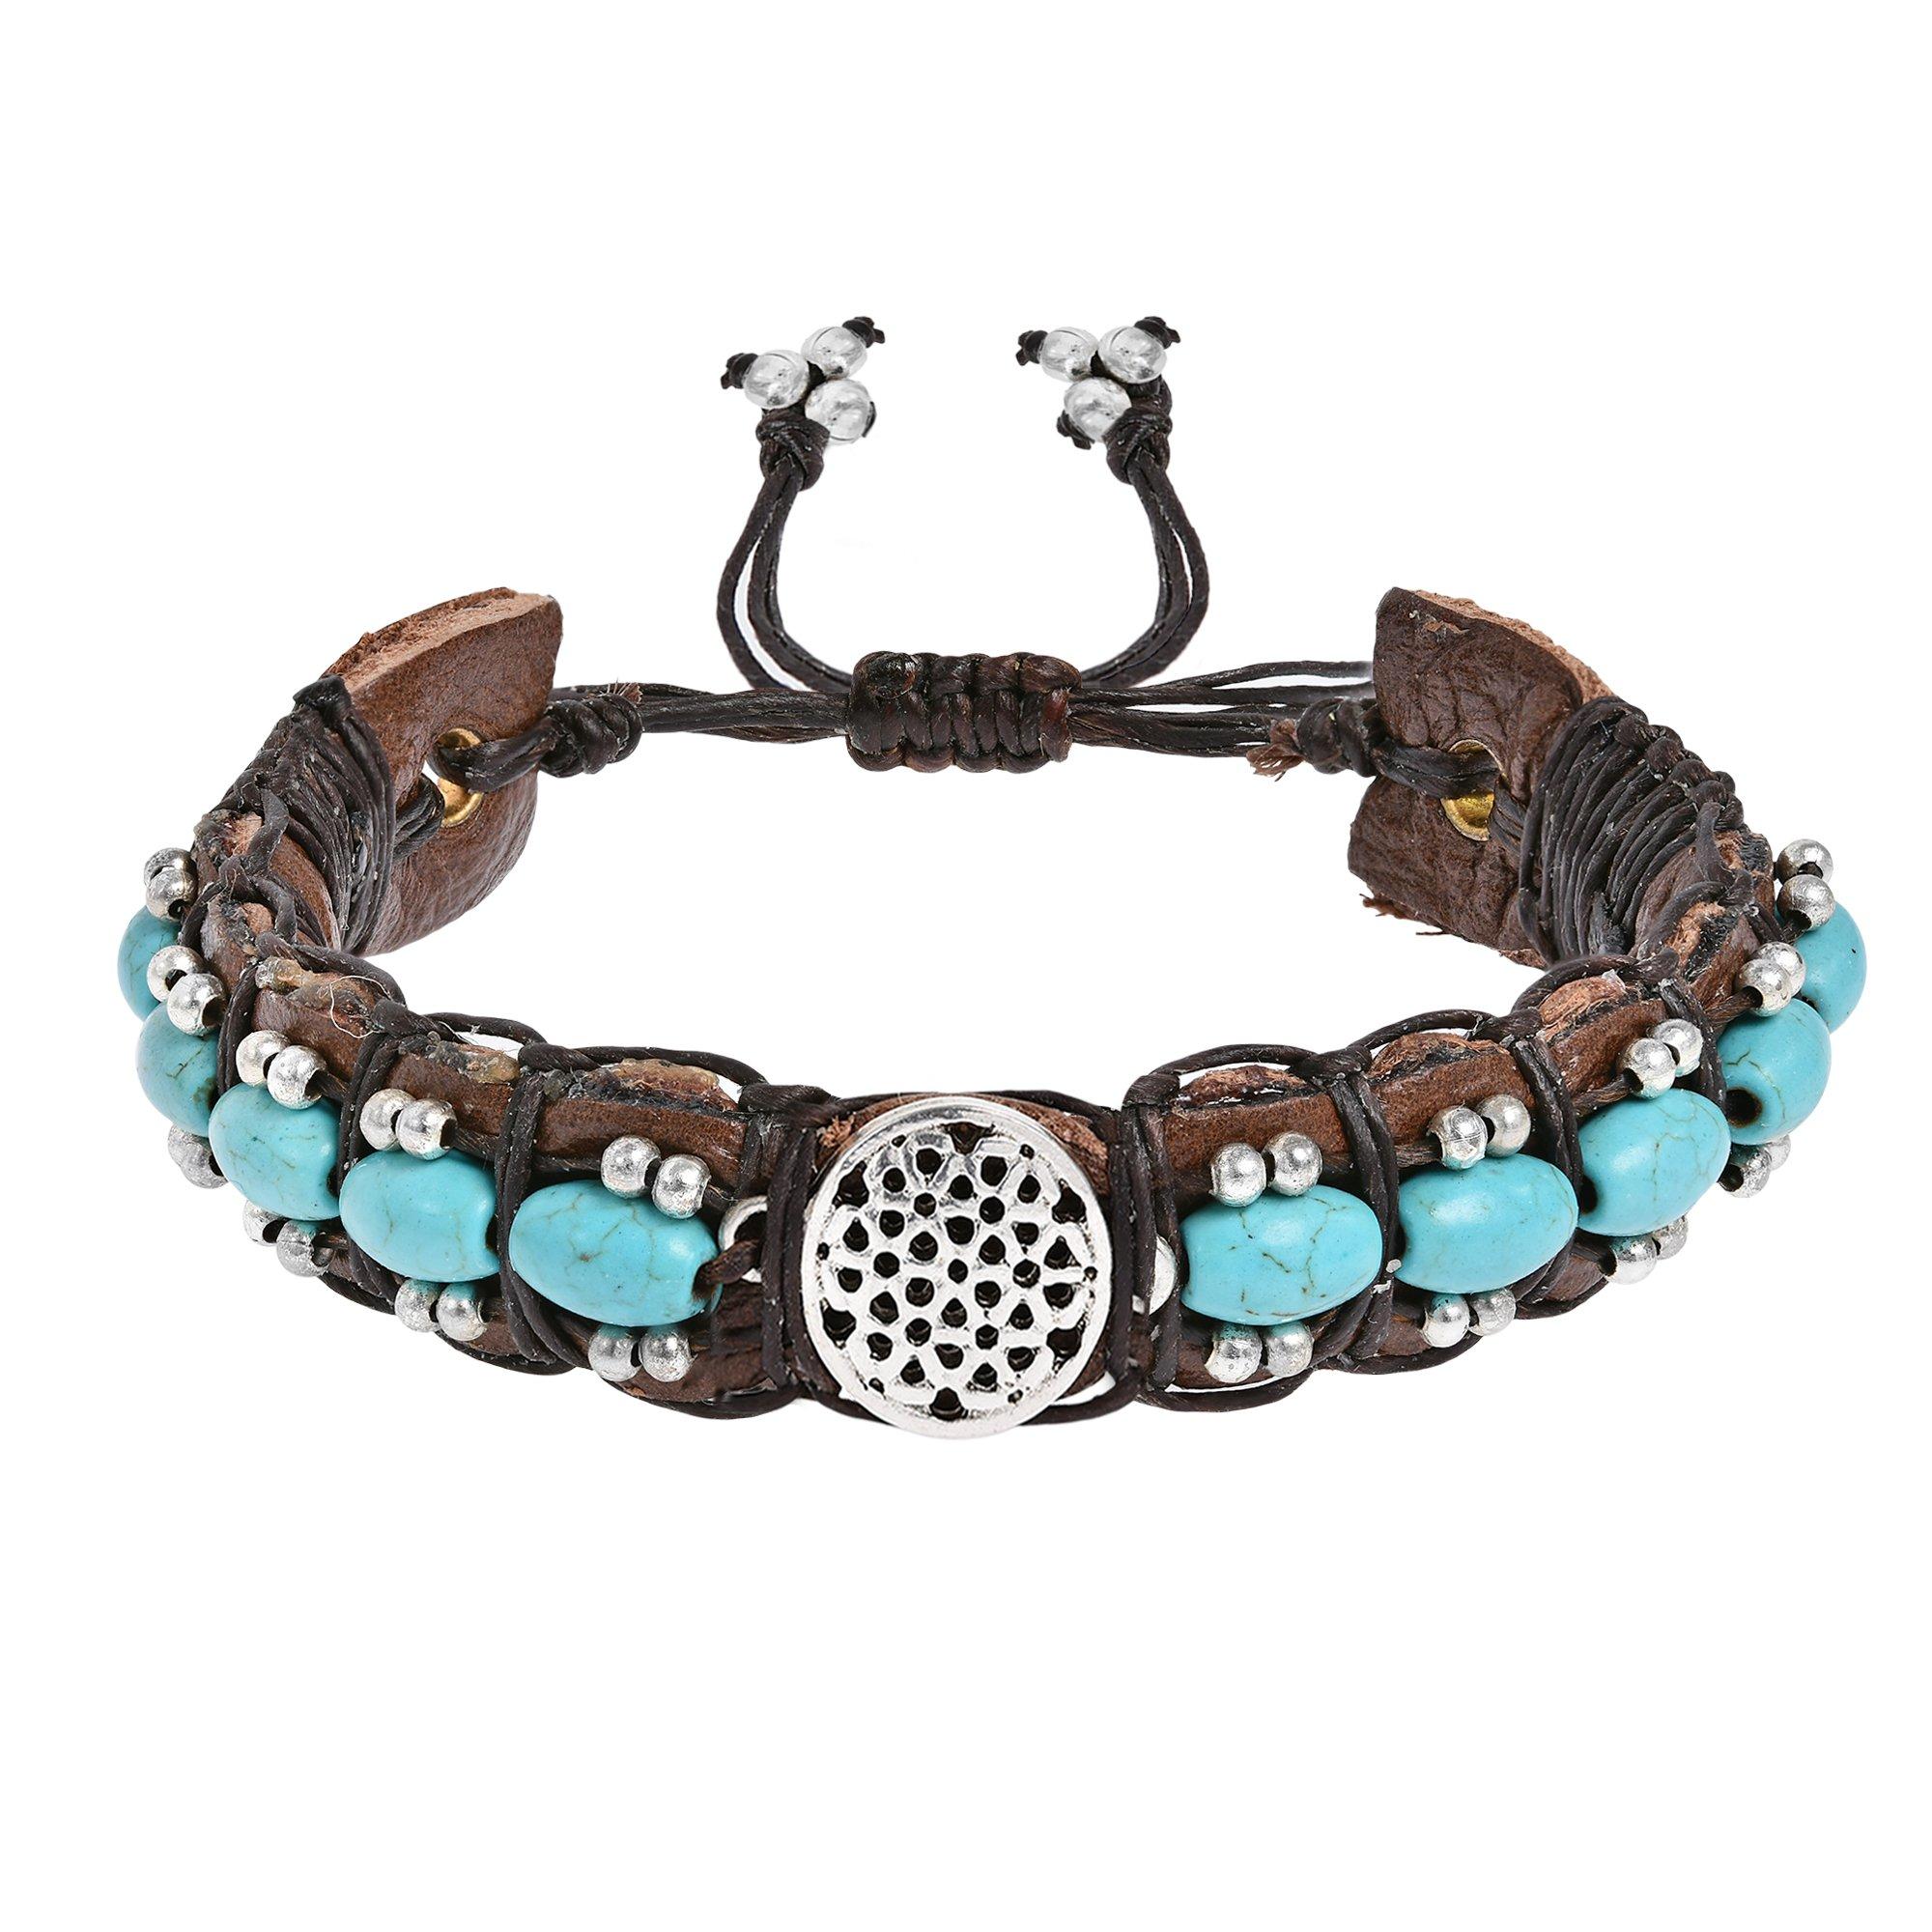 AeraVida Inspirational Flower of Life Simulated Turquoise Rolls Leather Adjustable Wrist Pull Bracelet